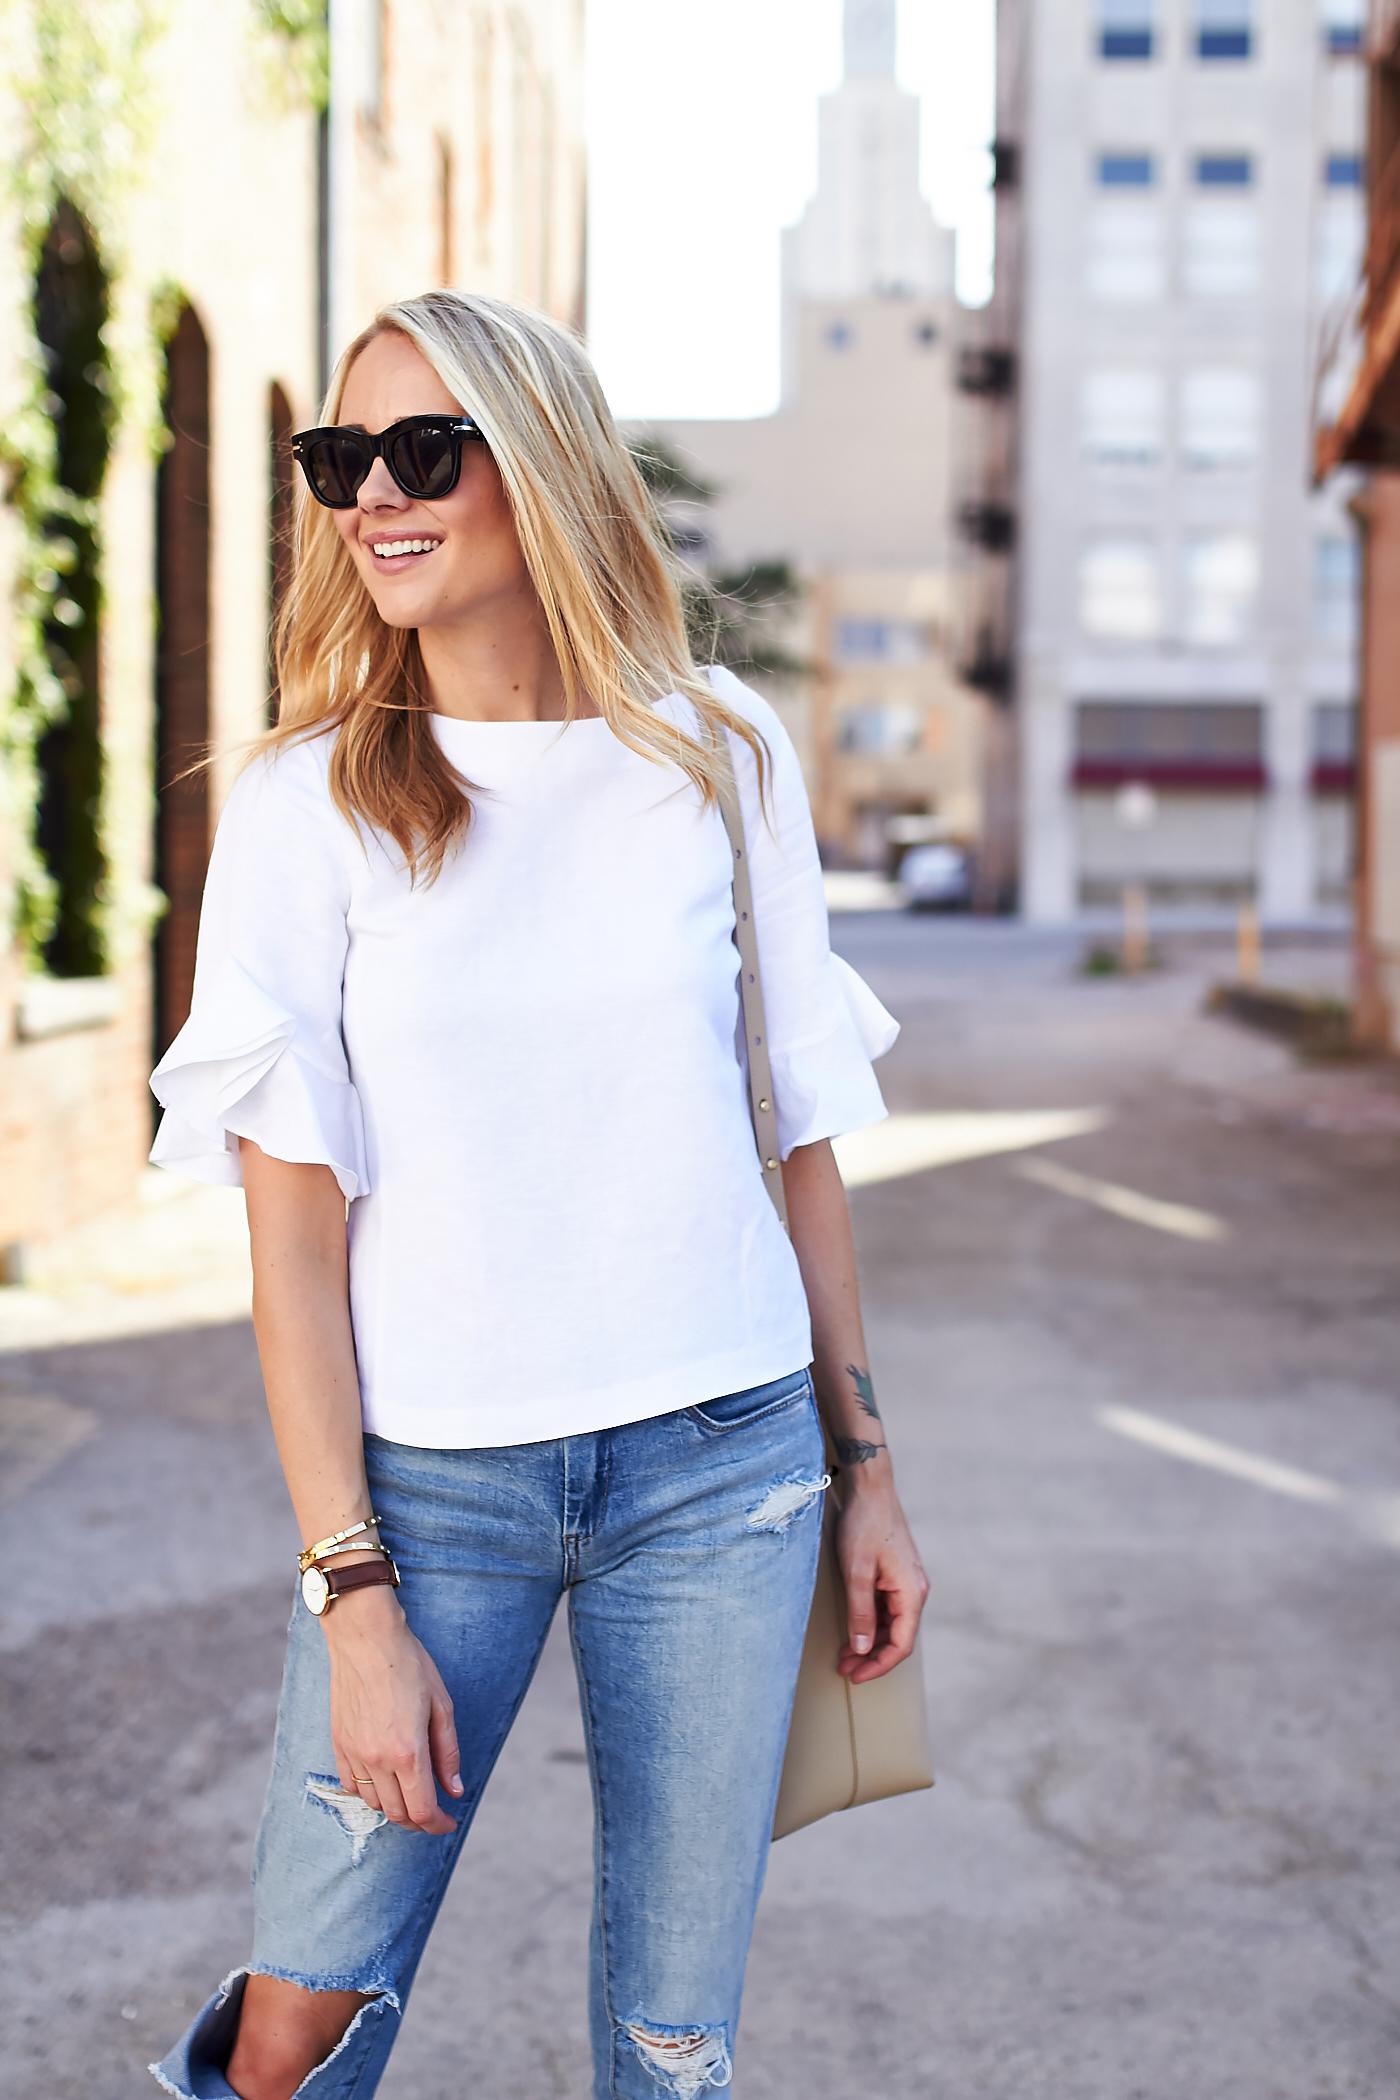 d4da50987be fashion-jackson-celine-sunglasses-white-ruffle-sleeve-top-